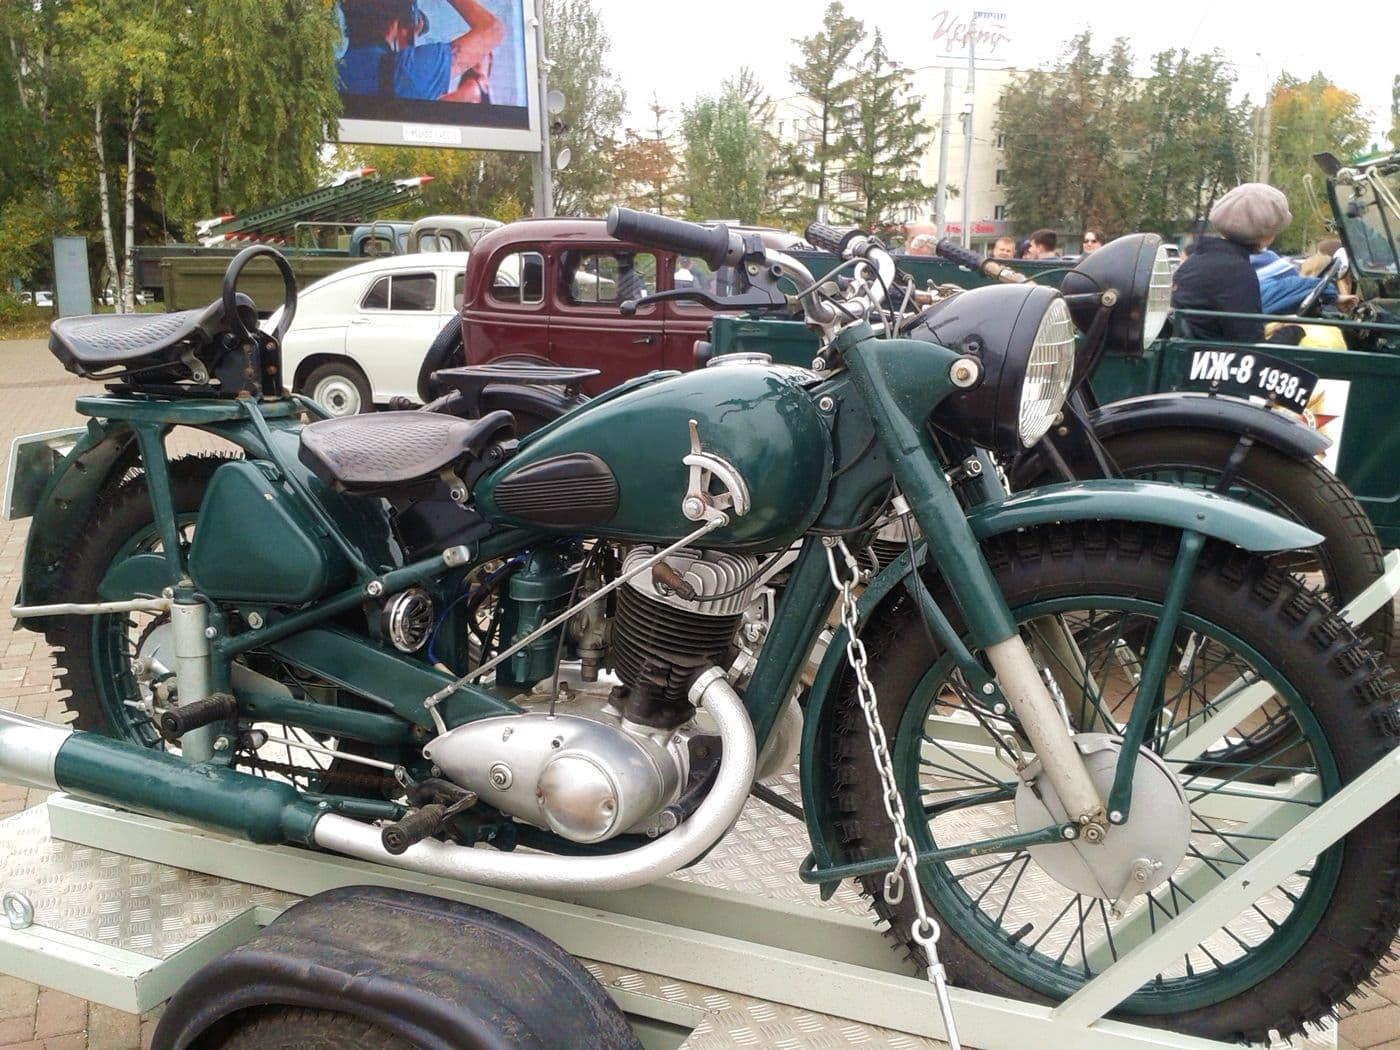 Мотоцикл Иж 49. Ижевск. Фото 2018 год. ДВА.